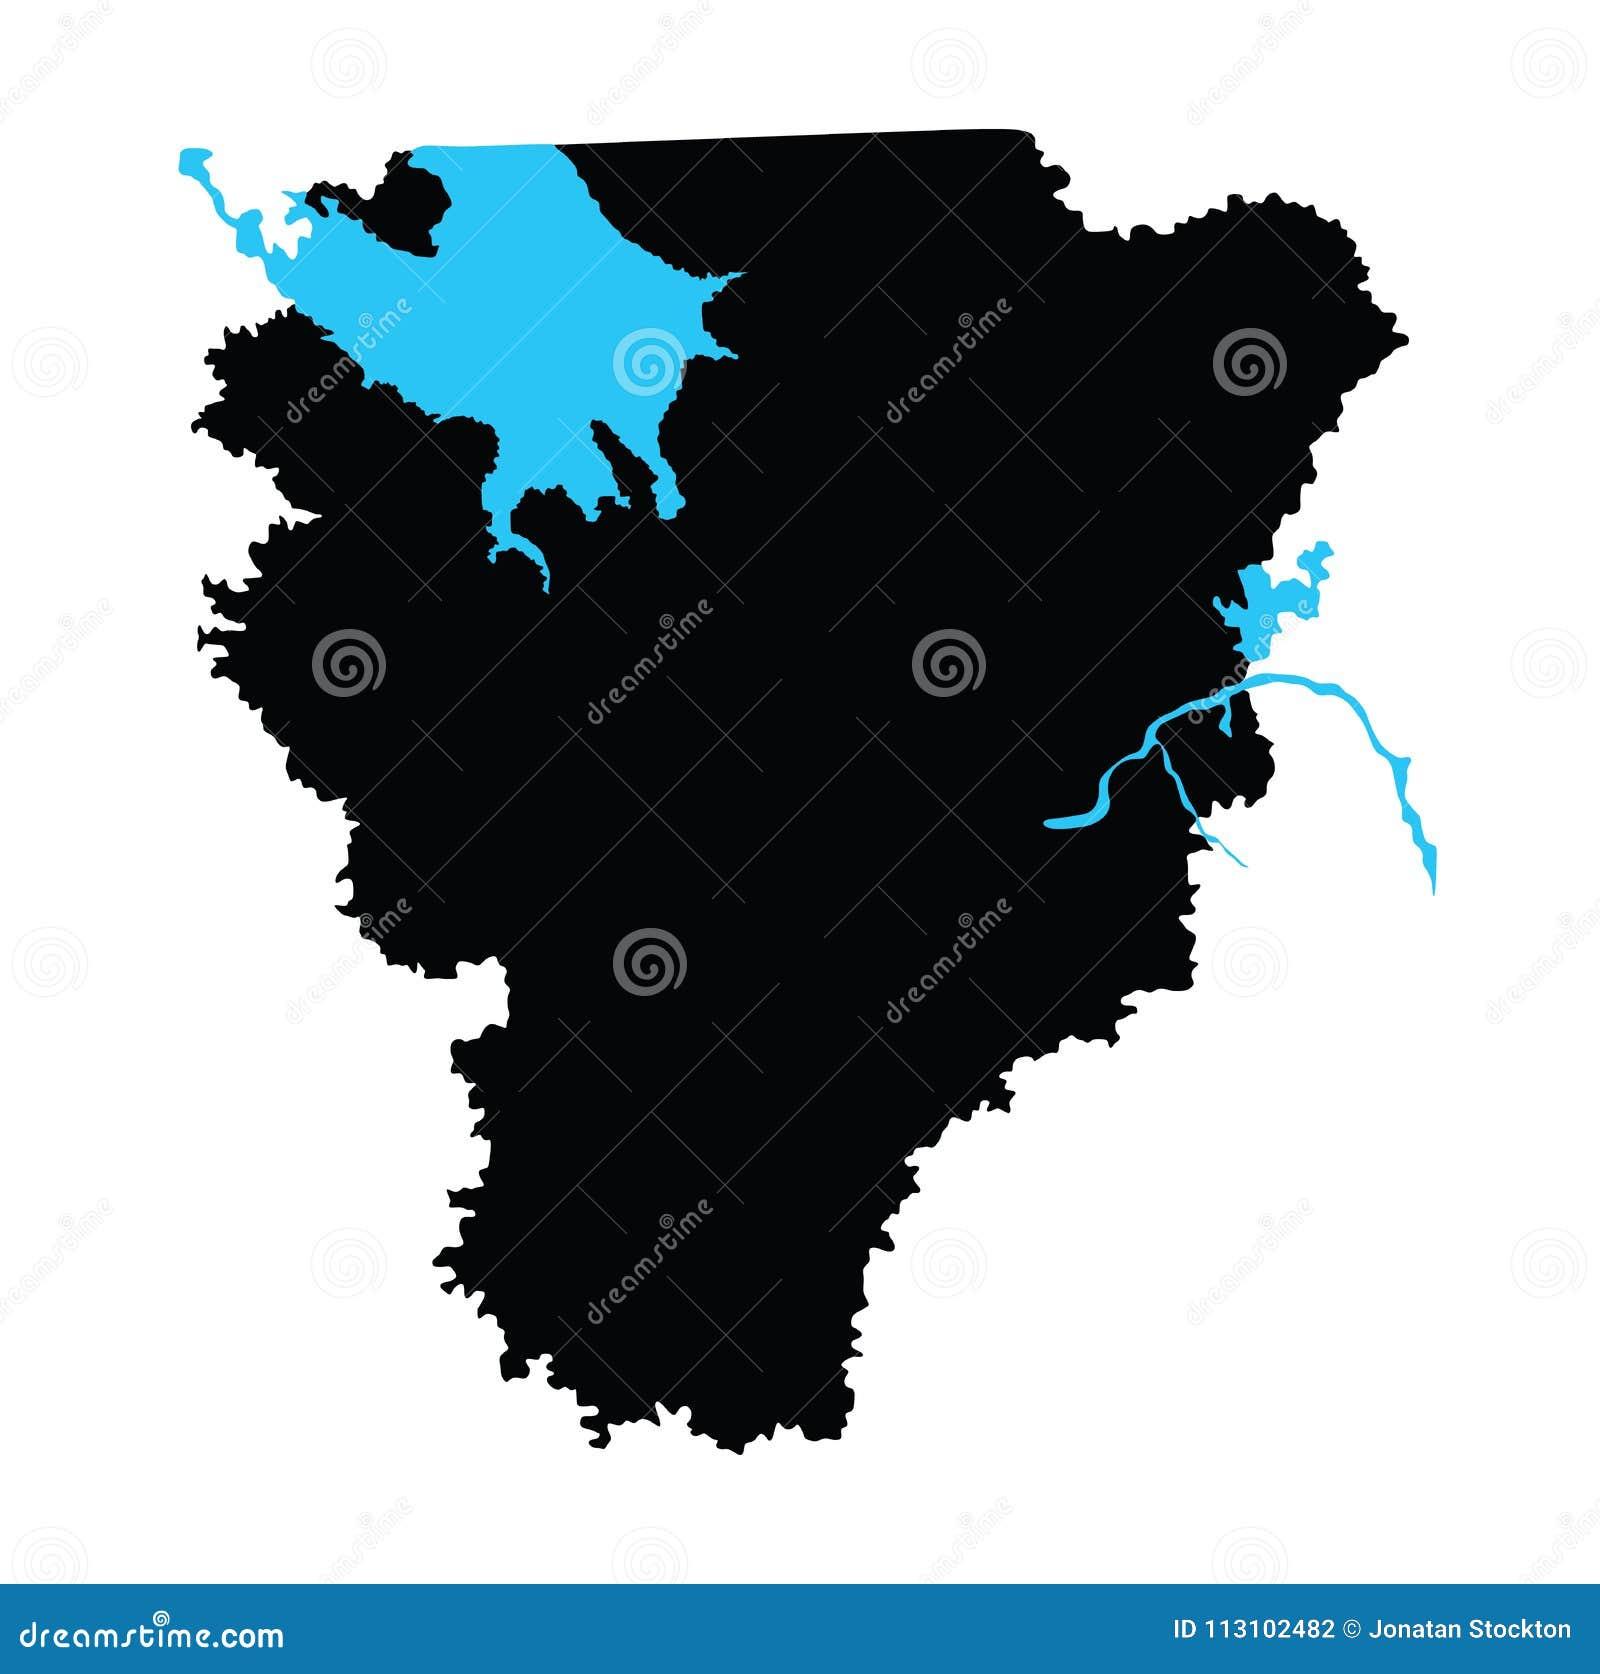 Yaroslavl Oblast Map. Russia Oblast Map Illustration.kaluskaya ... on elista russia map, tyumen russia map, mandrogi russia map, saint petersburg, yekaterinburg russia map, zagorsk russia map, altai krai russia map, simferopol russia map, astrakhan russia map, severomorsk russia map, sevastopol russia map, samarkand russia map, uglich russia map, tallinn russia map, murmansk russia map, lokomotiv yaroslavl, lake baikal, nizhny novgorod, yurga russia map, tuva russia map, kalmykia russia map, krasnogorsk russia map, sarajevo russia map,